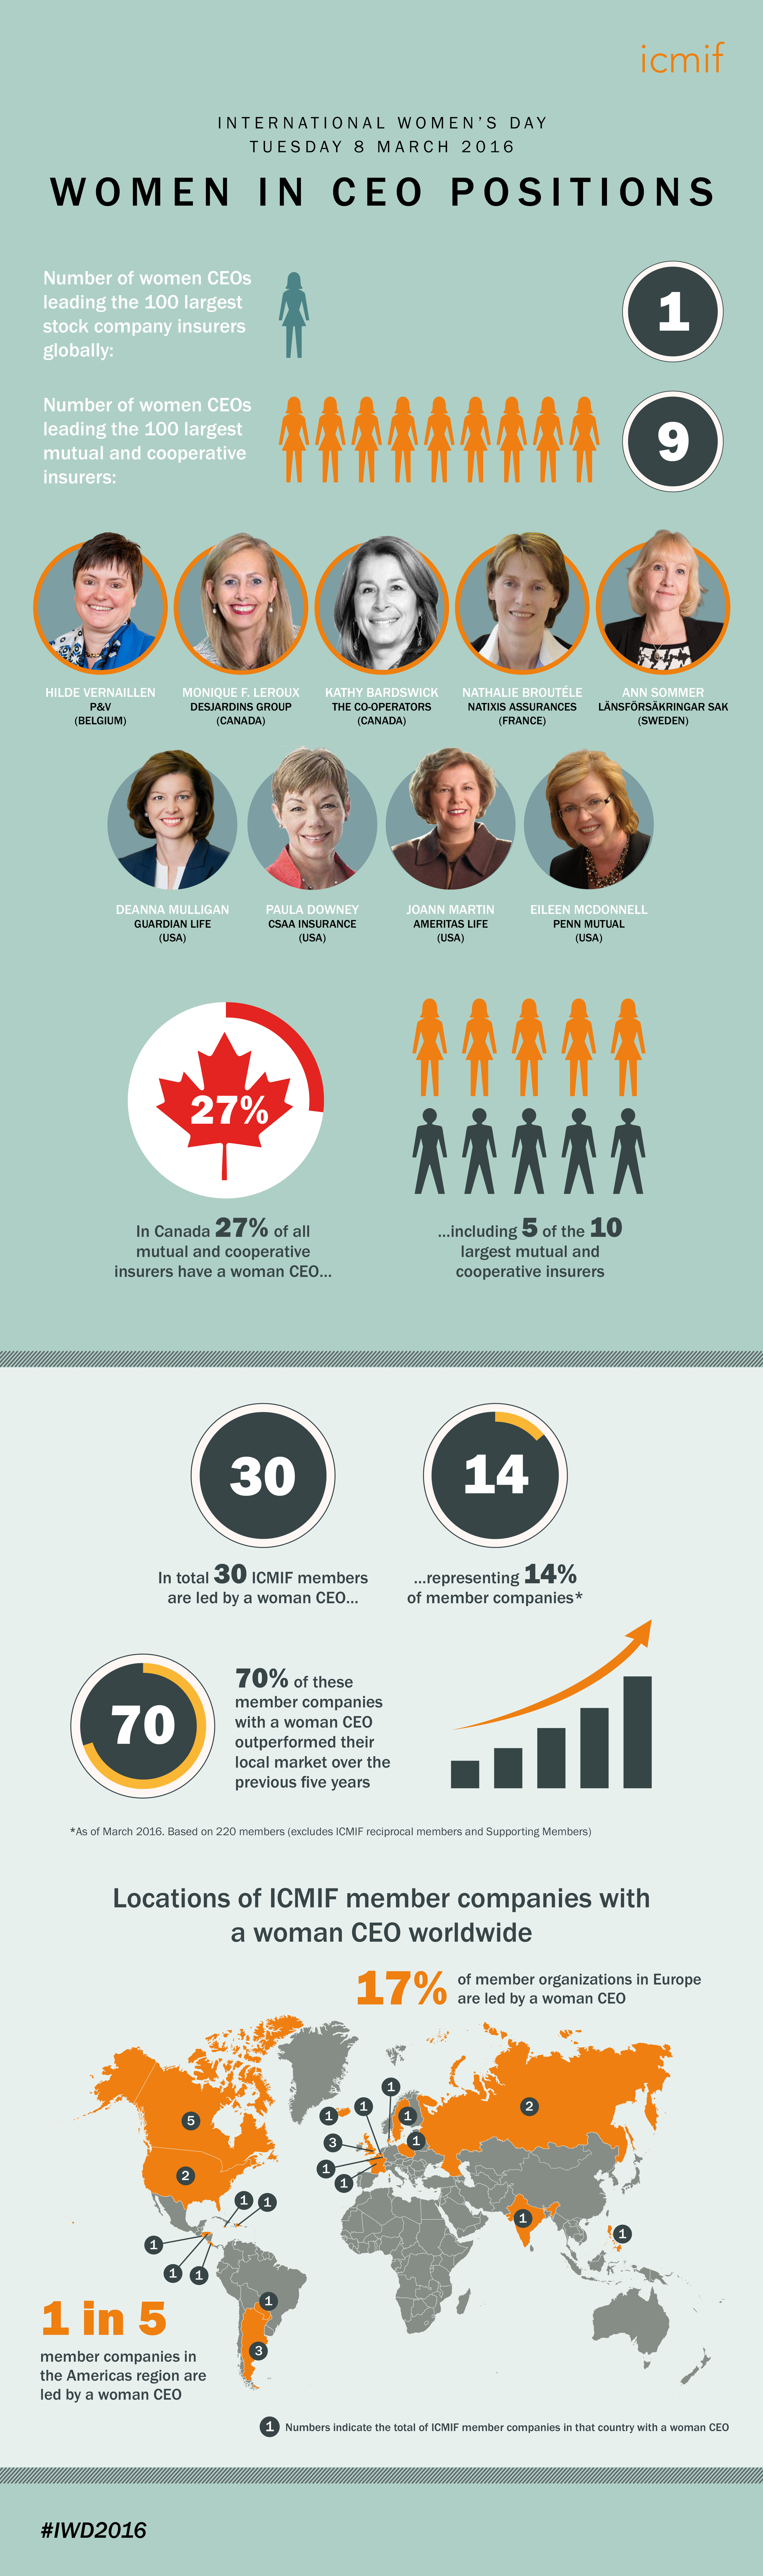 ICMIF Infographic - International Womens Day 2016